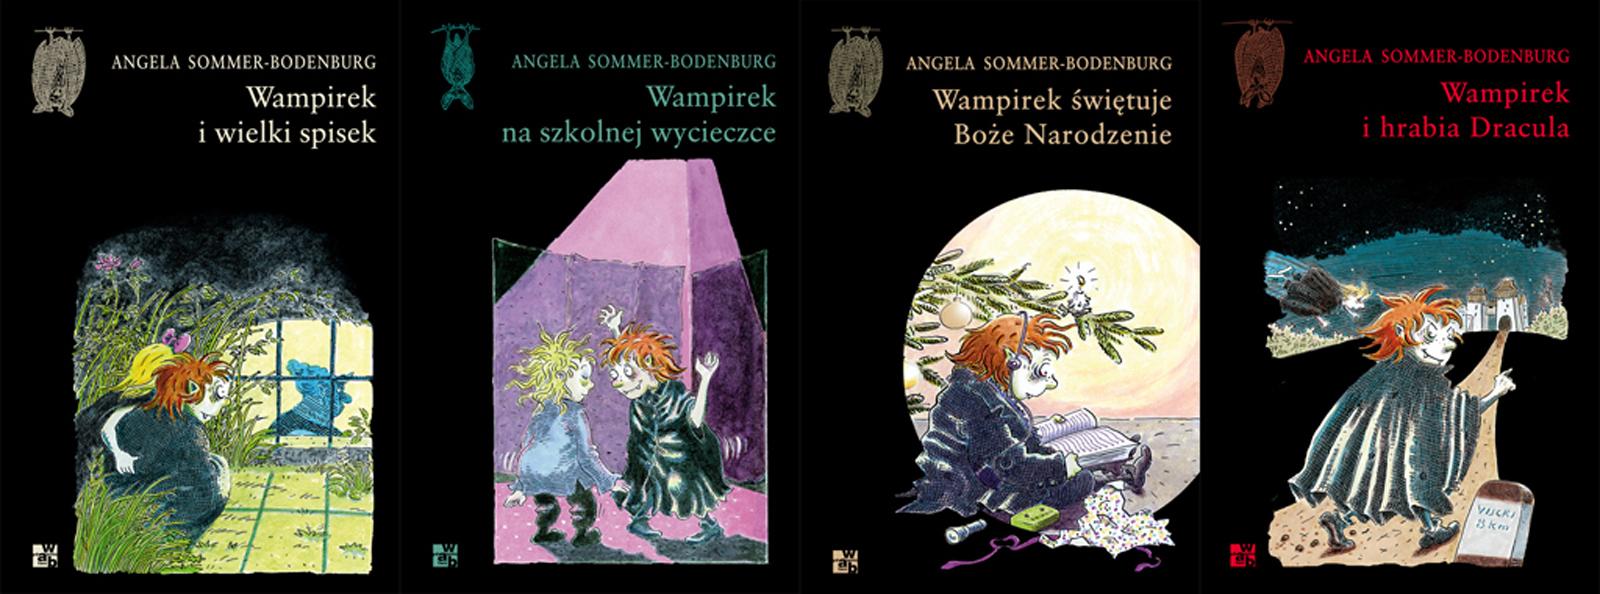 wampirki-13-16